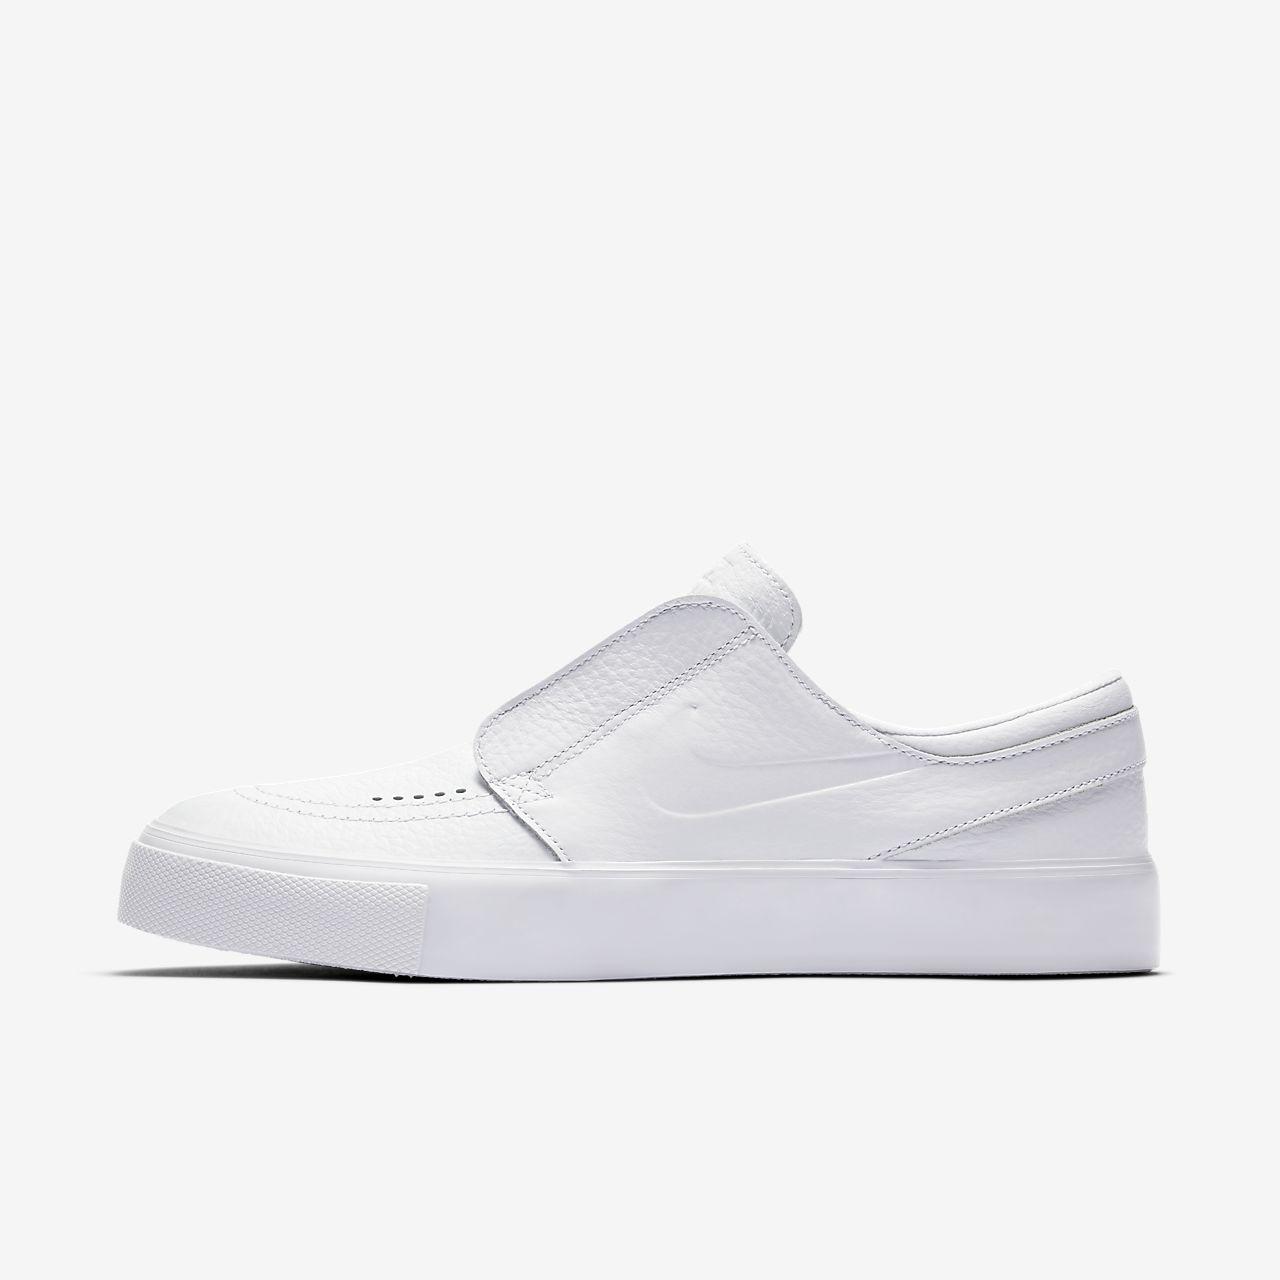 1f5ef7b30f31 Détails. nike sb slip on homme. Nike SB Alle Schuhe ...